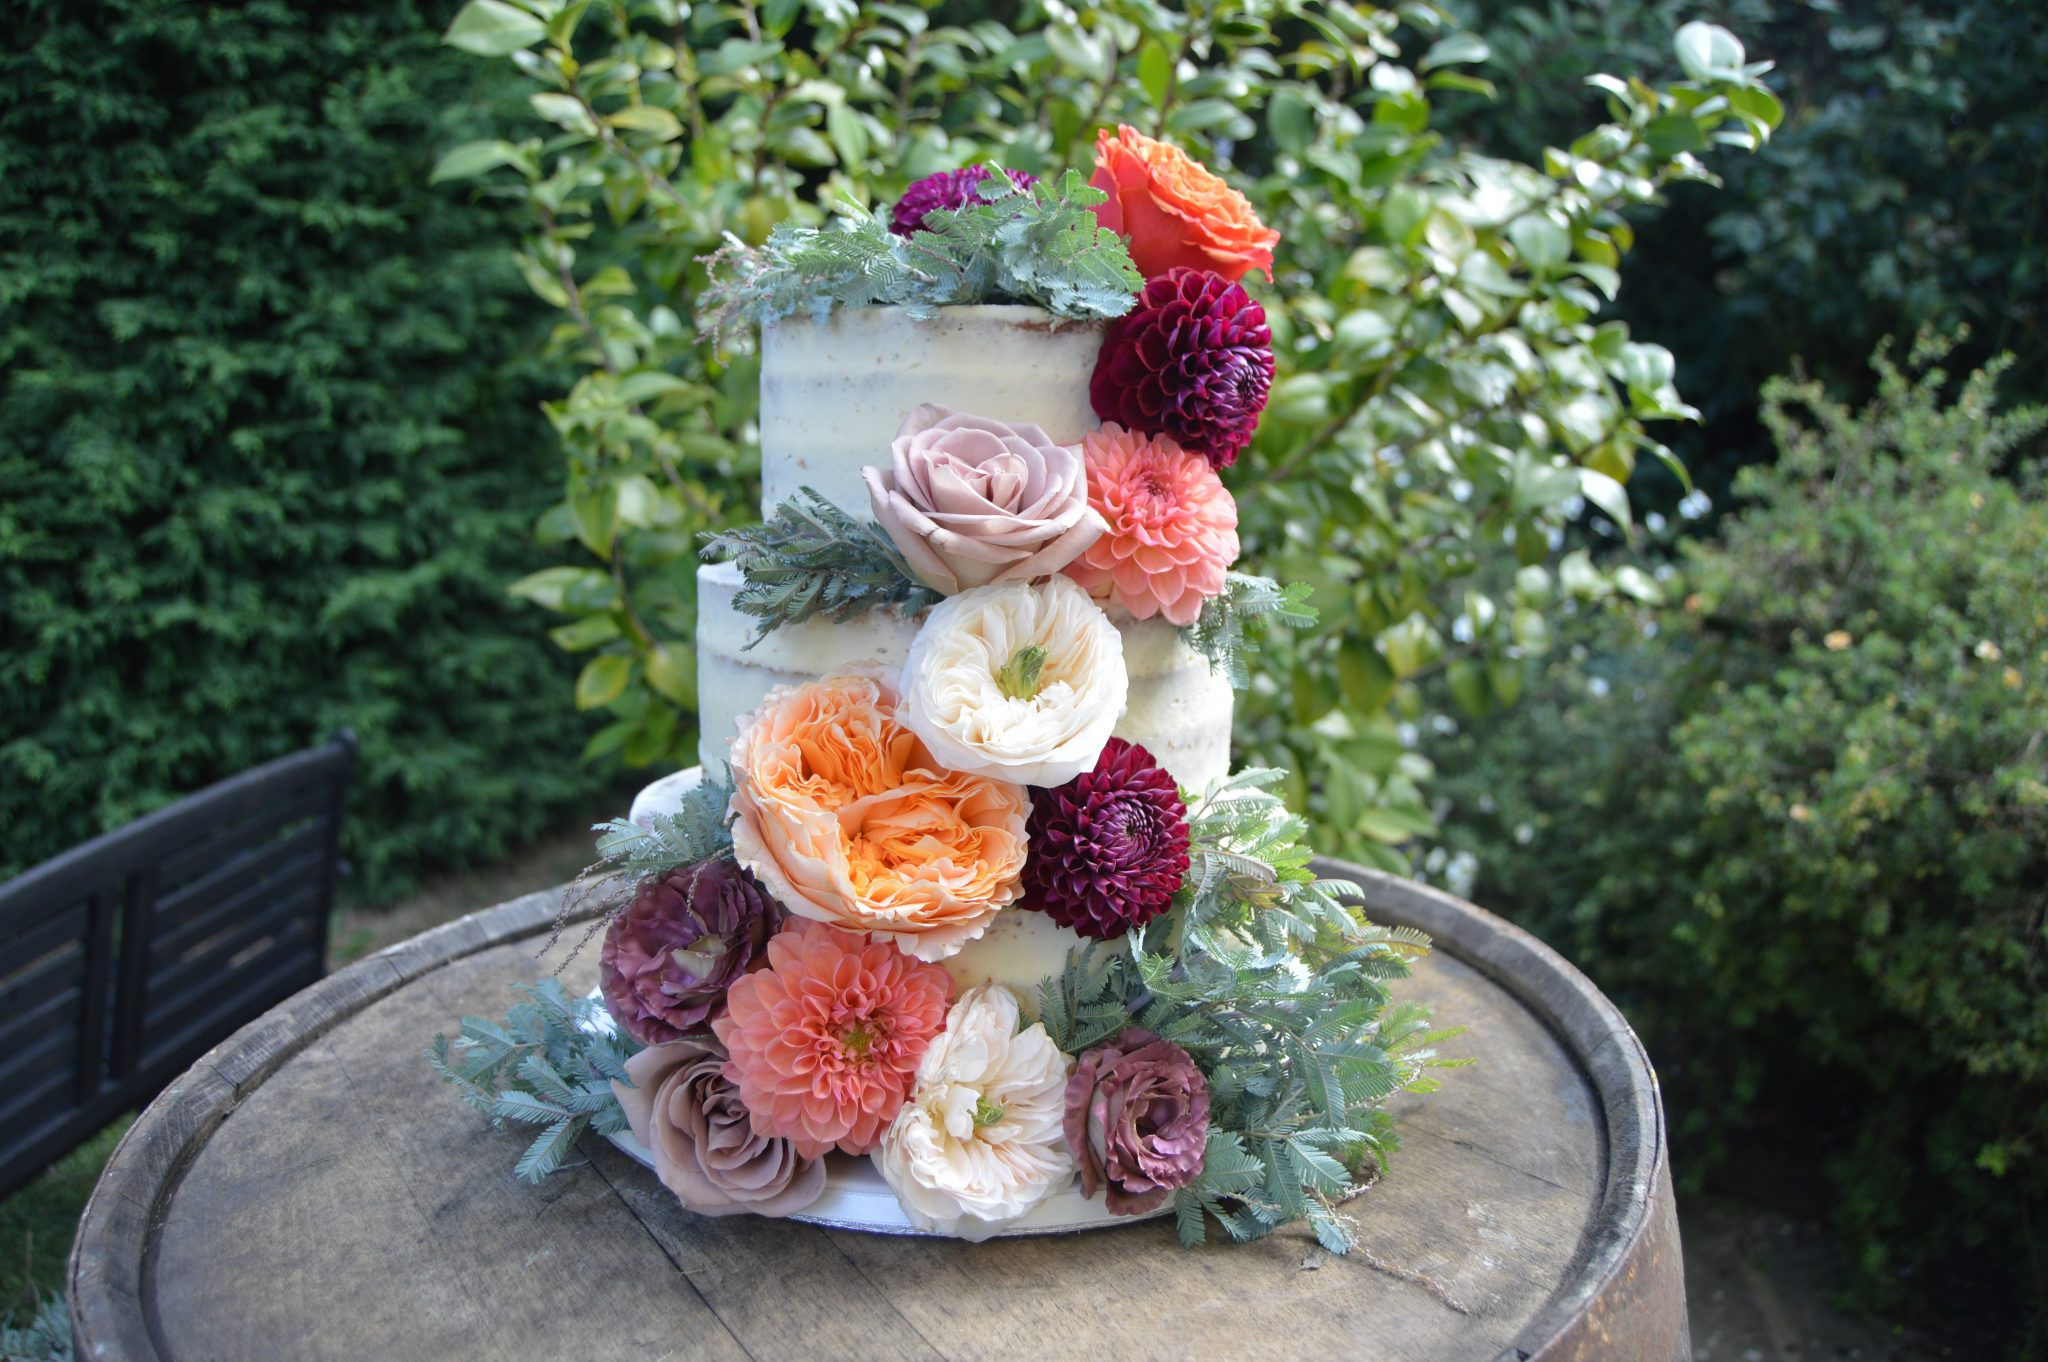 Nic's Slice of Heaven floral buttercream wedding cake